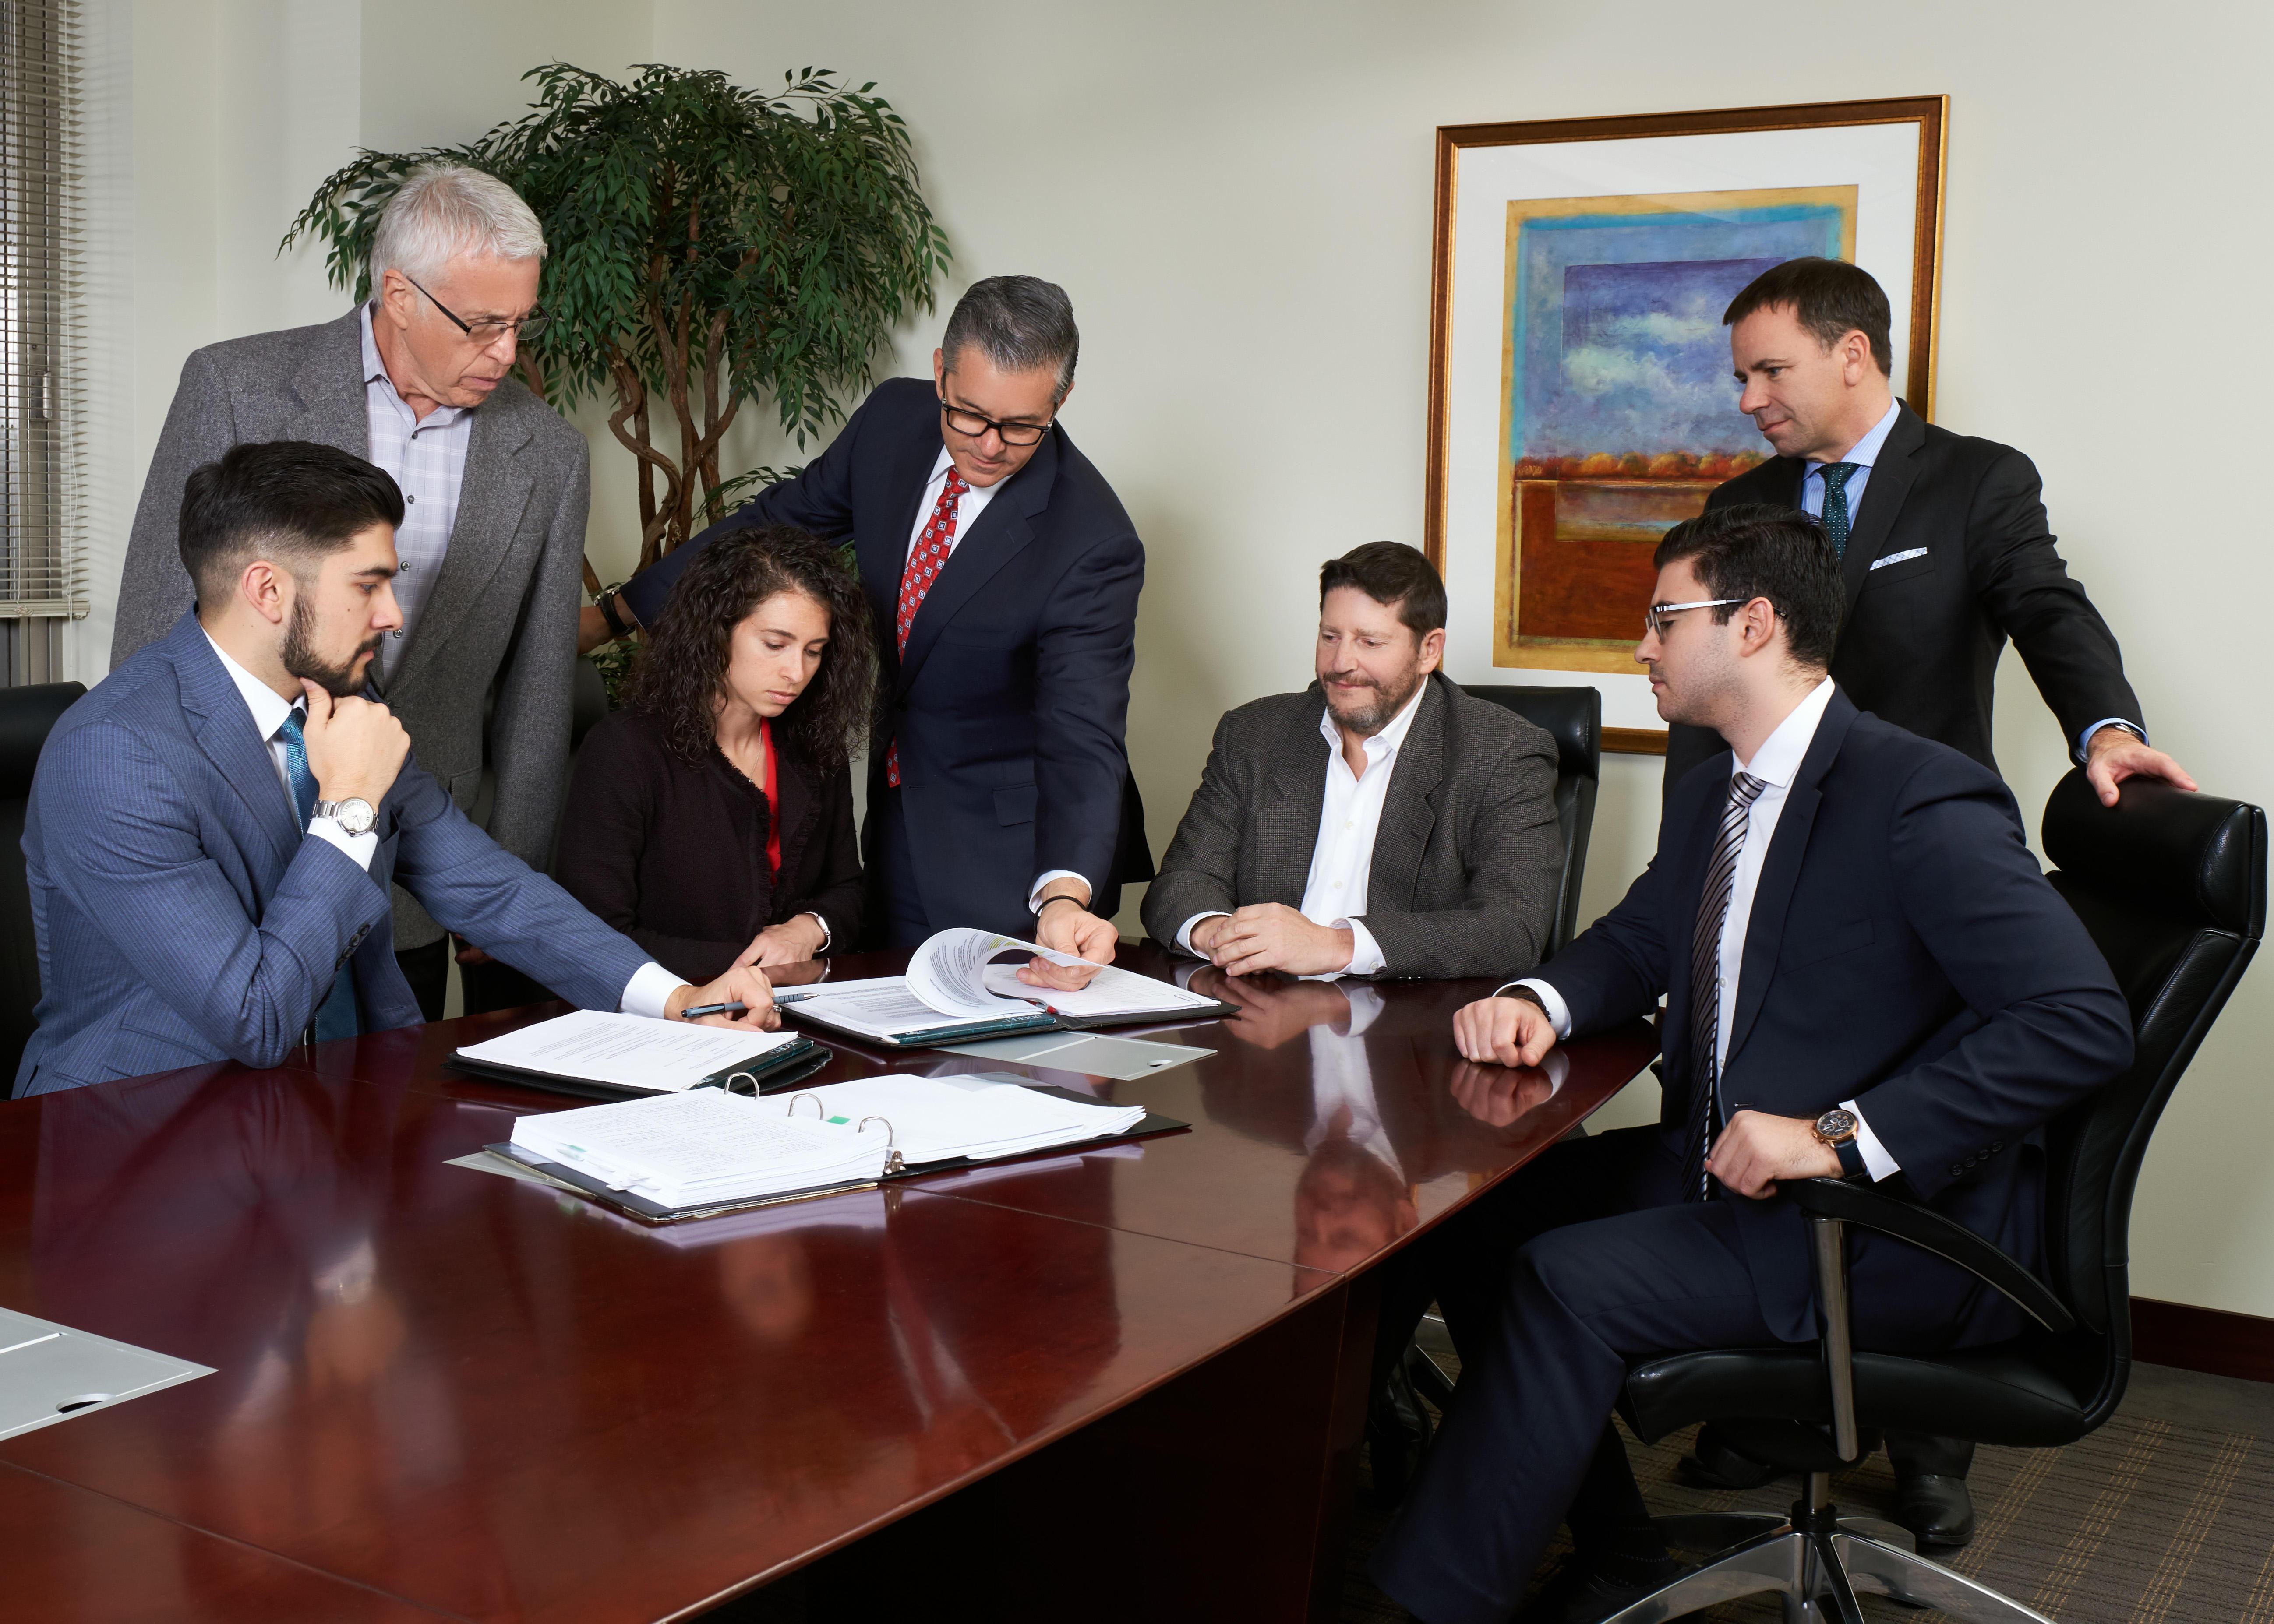 GWC Injury Lawyers LLC image 1